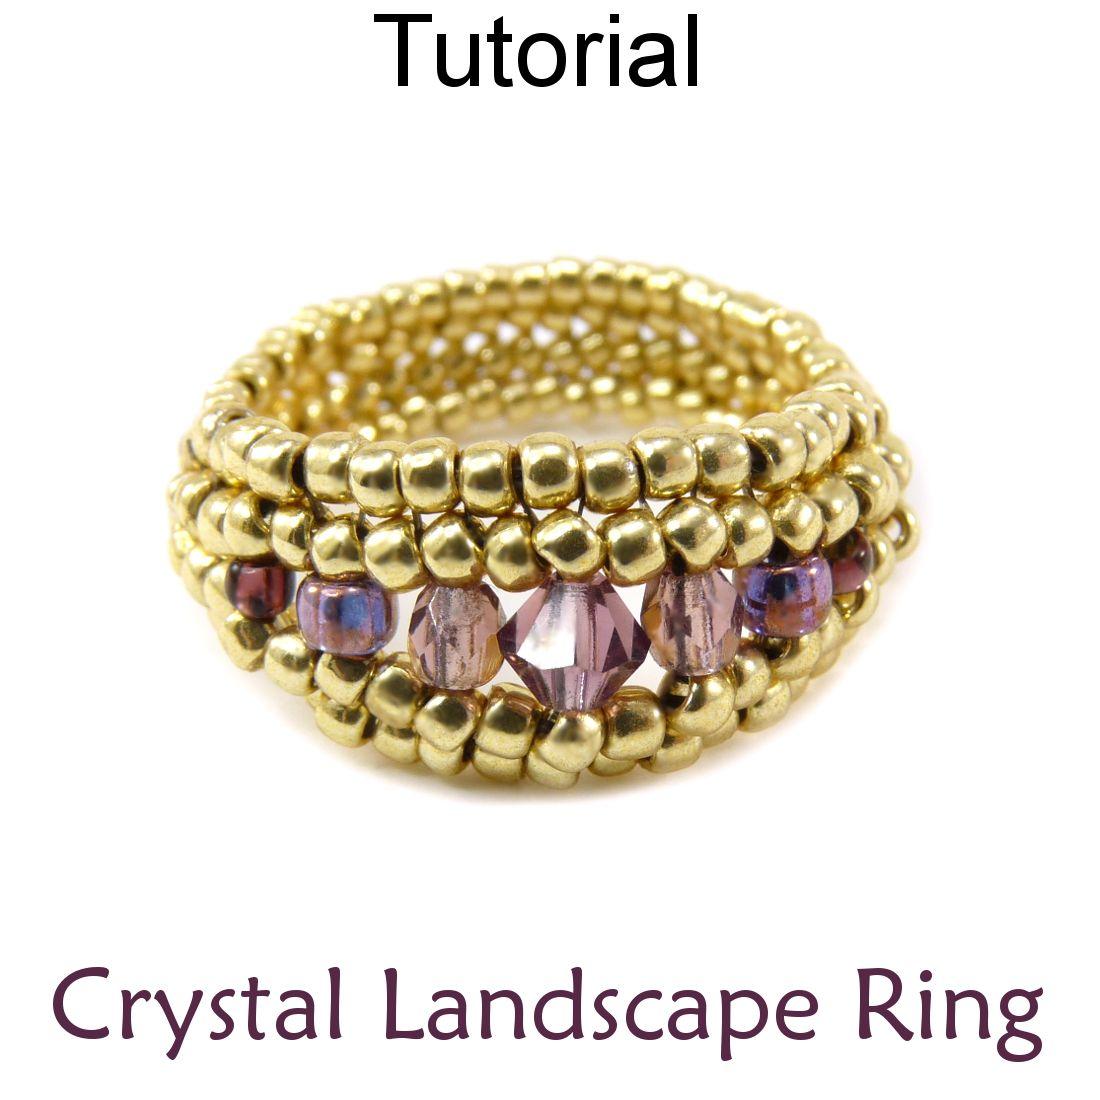 Beaded Crystal Landscape Ring Herringbone Beading Pattern Tutorial ...